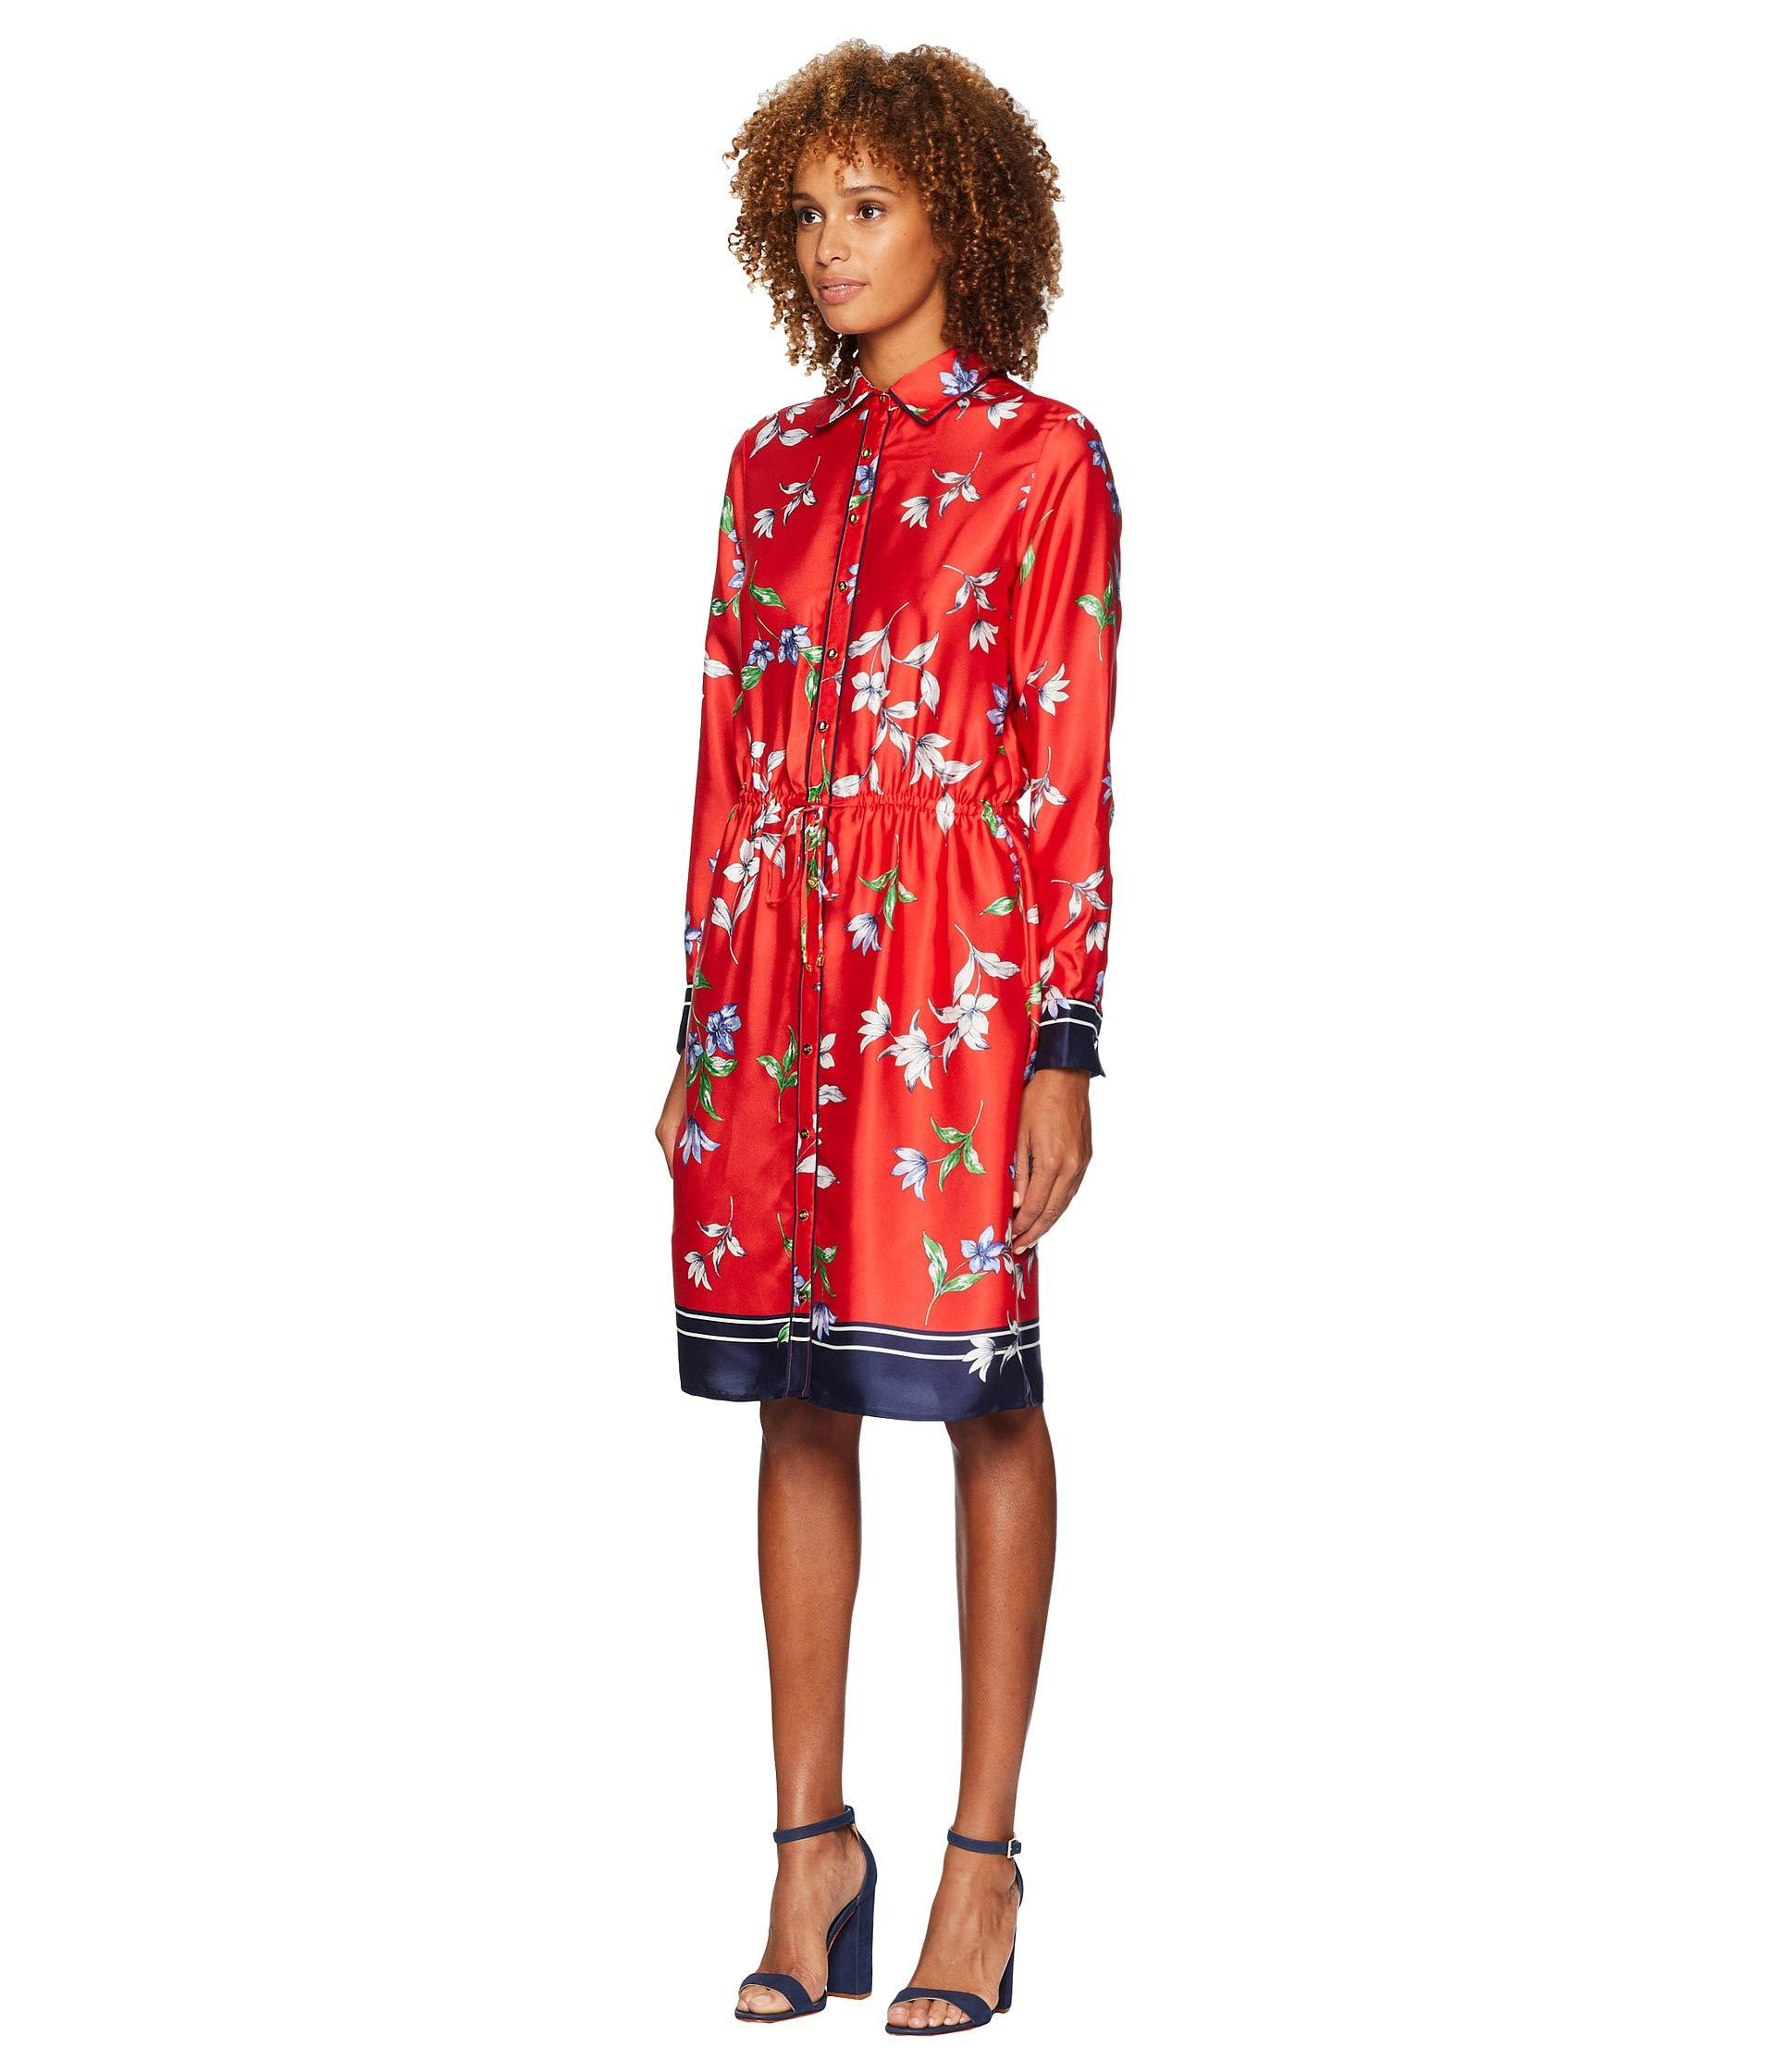 8af8ac15cc589 Lyst - Lauren by Ralph Lauren Floral-print Twill Shirtdress in Red - Save  50%